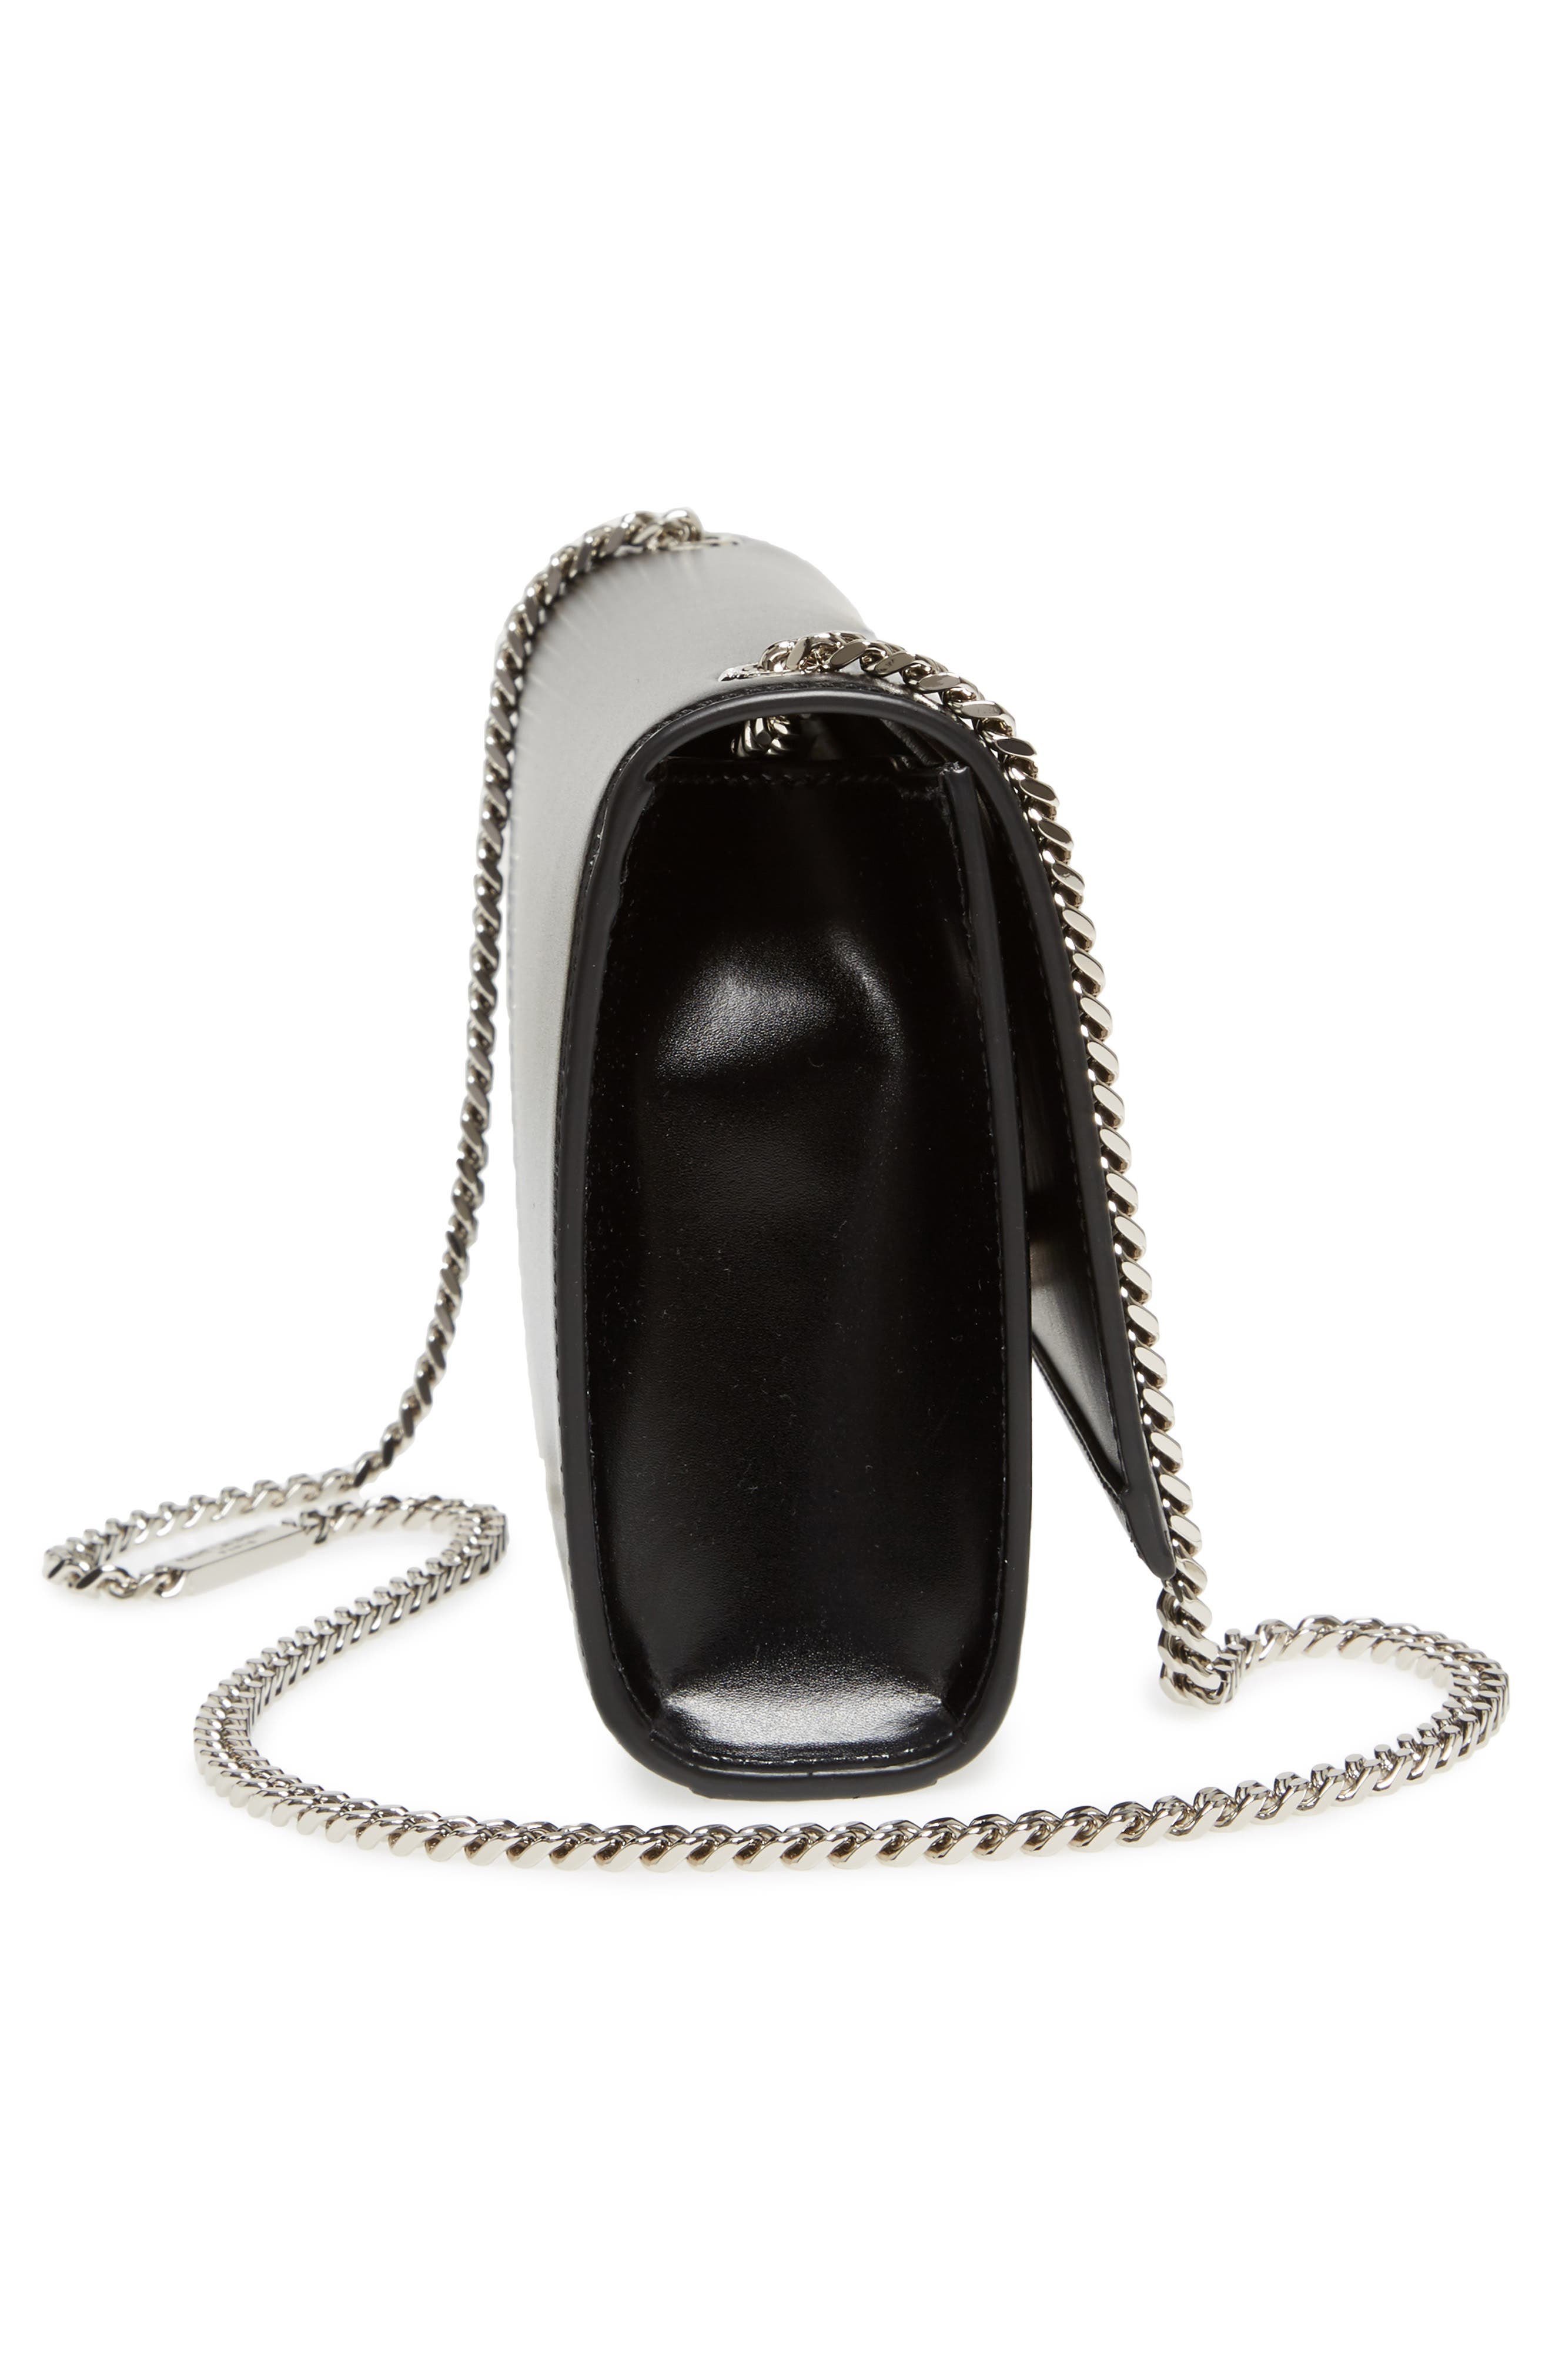 Medium Kate Calfskin Leather Crossbody Bag,                             Alternate thumbnail 5, color,                             Noir